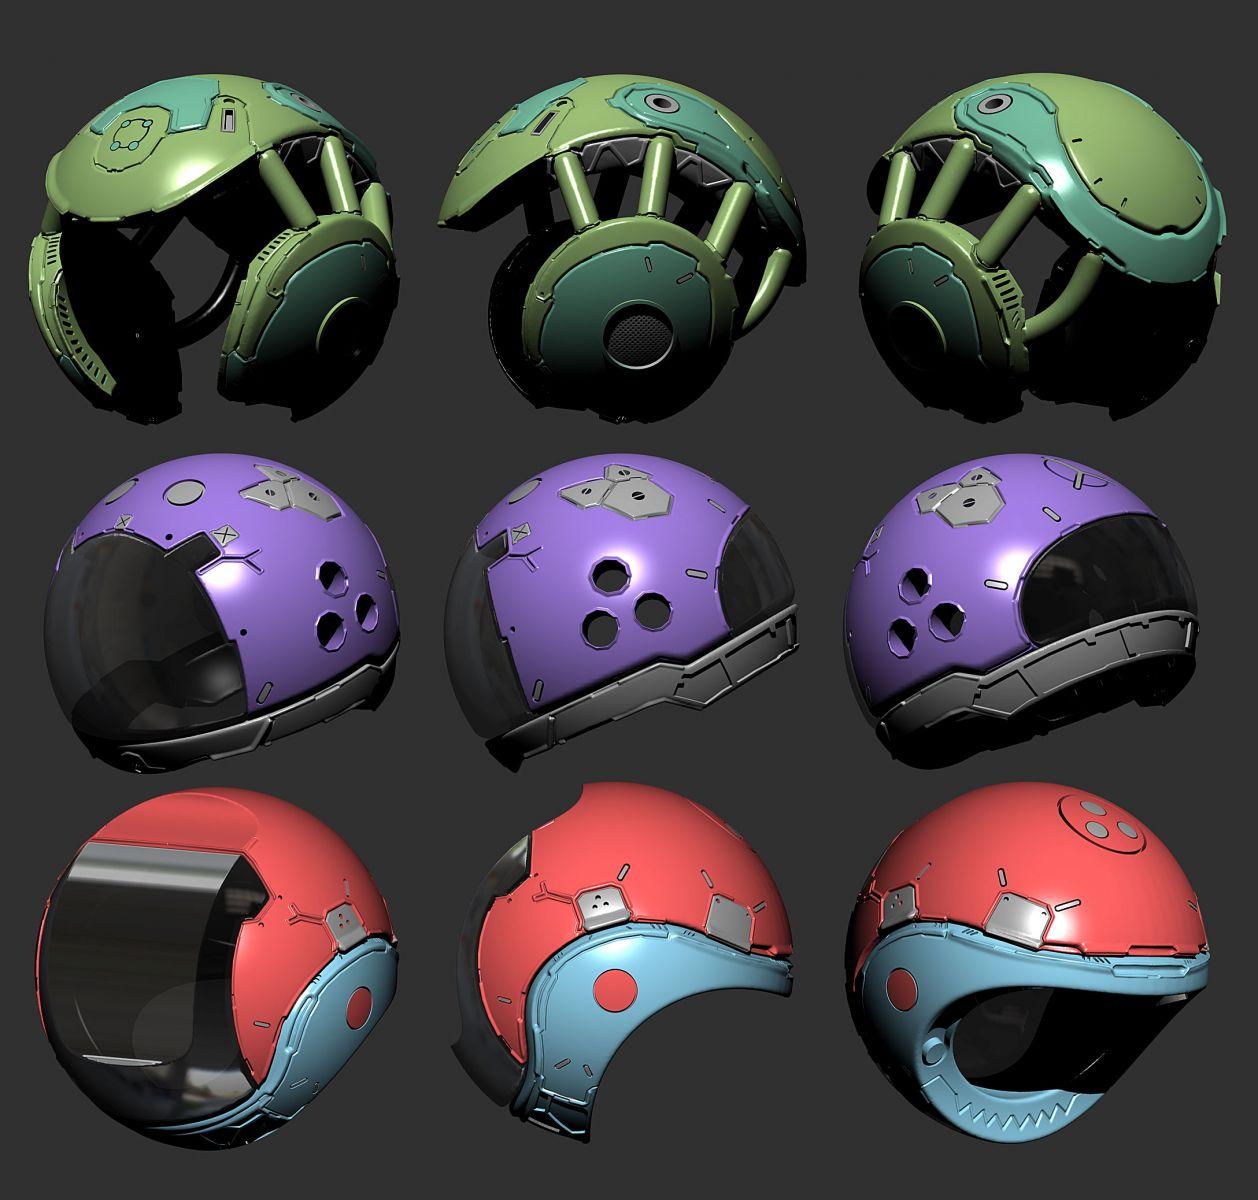 Helmet design set 06